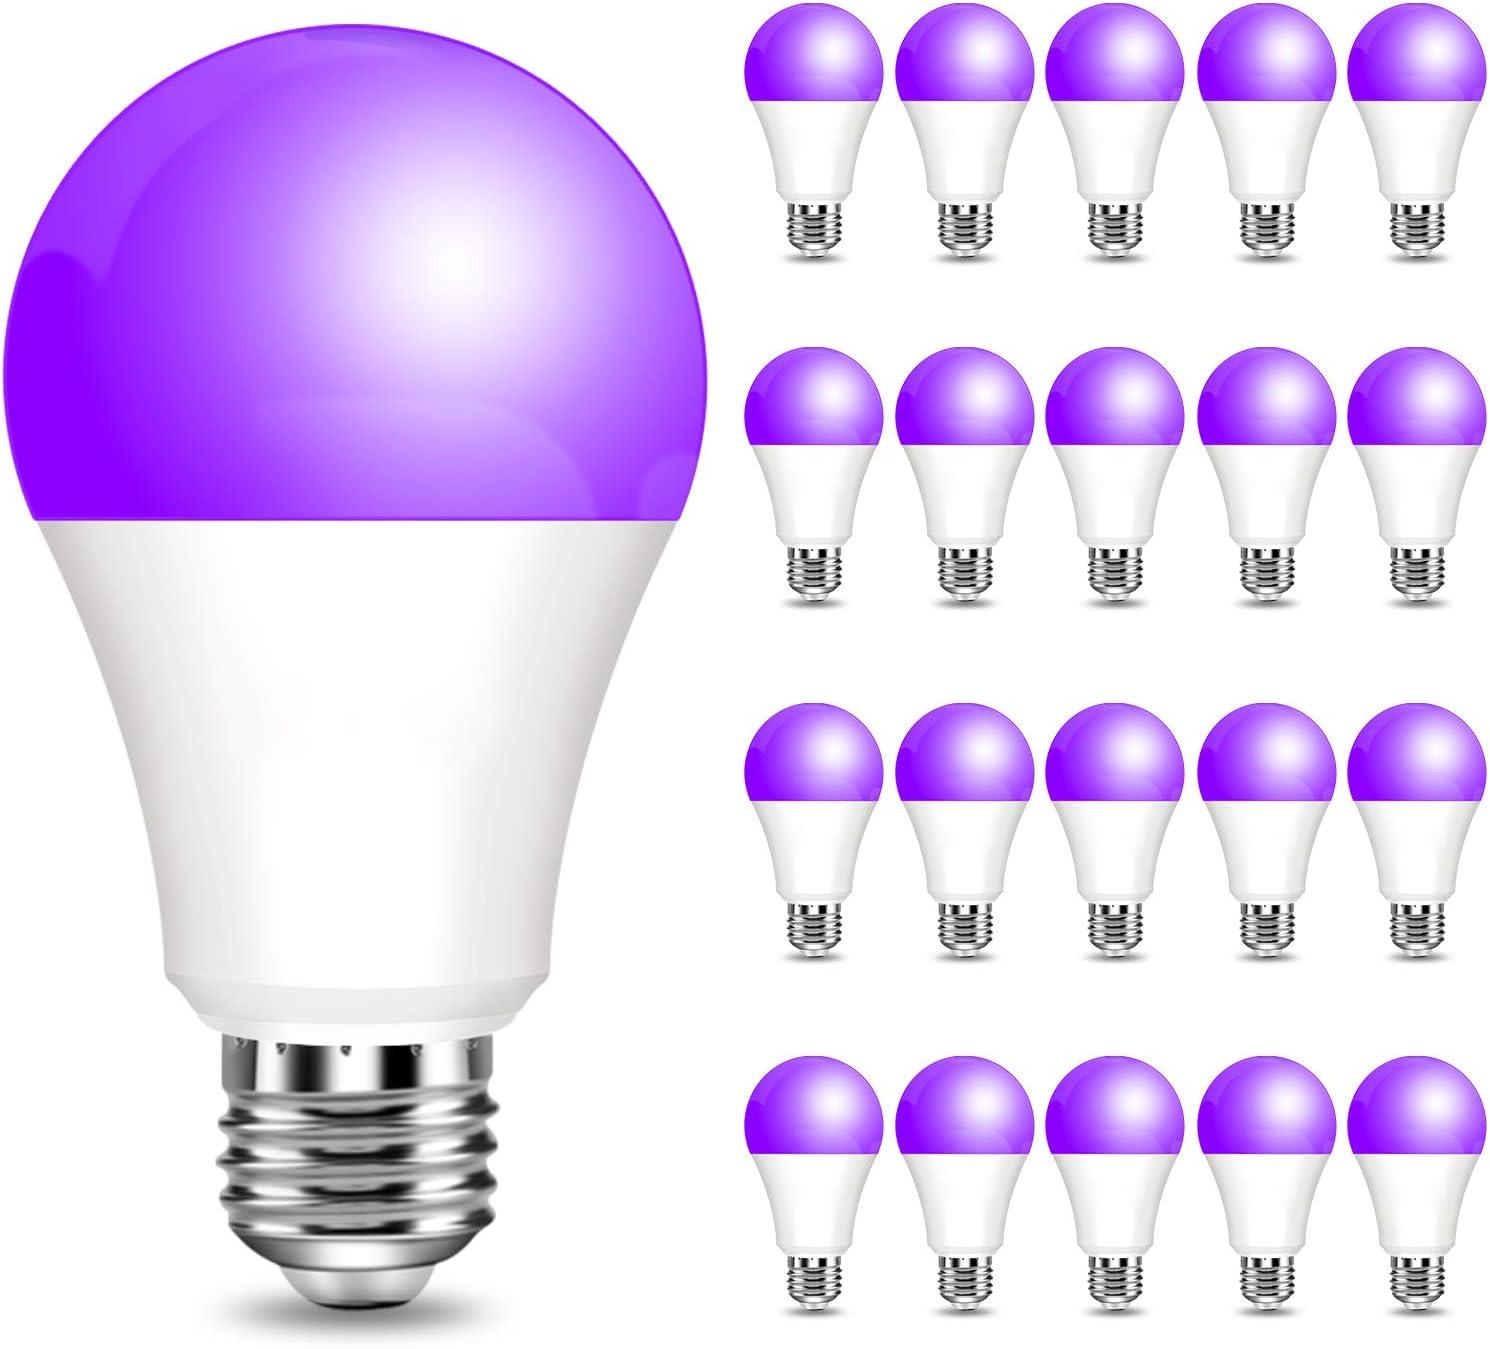 20 Ranking TOP3 Pack 9W led Max 52% OFF Black Light Lights Bulb Base A19 E26 Screw